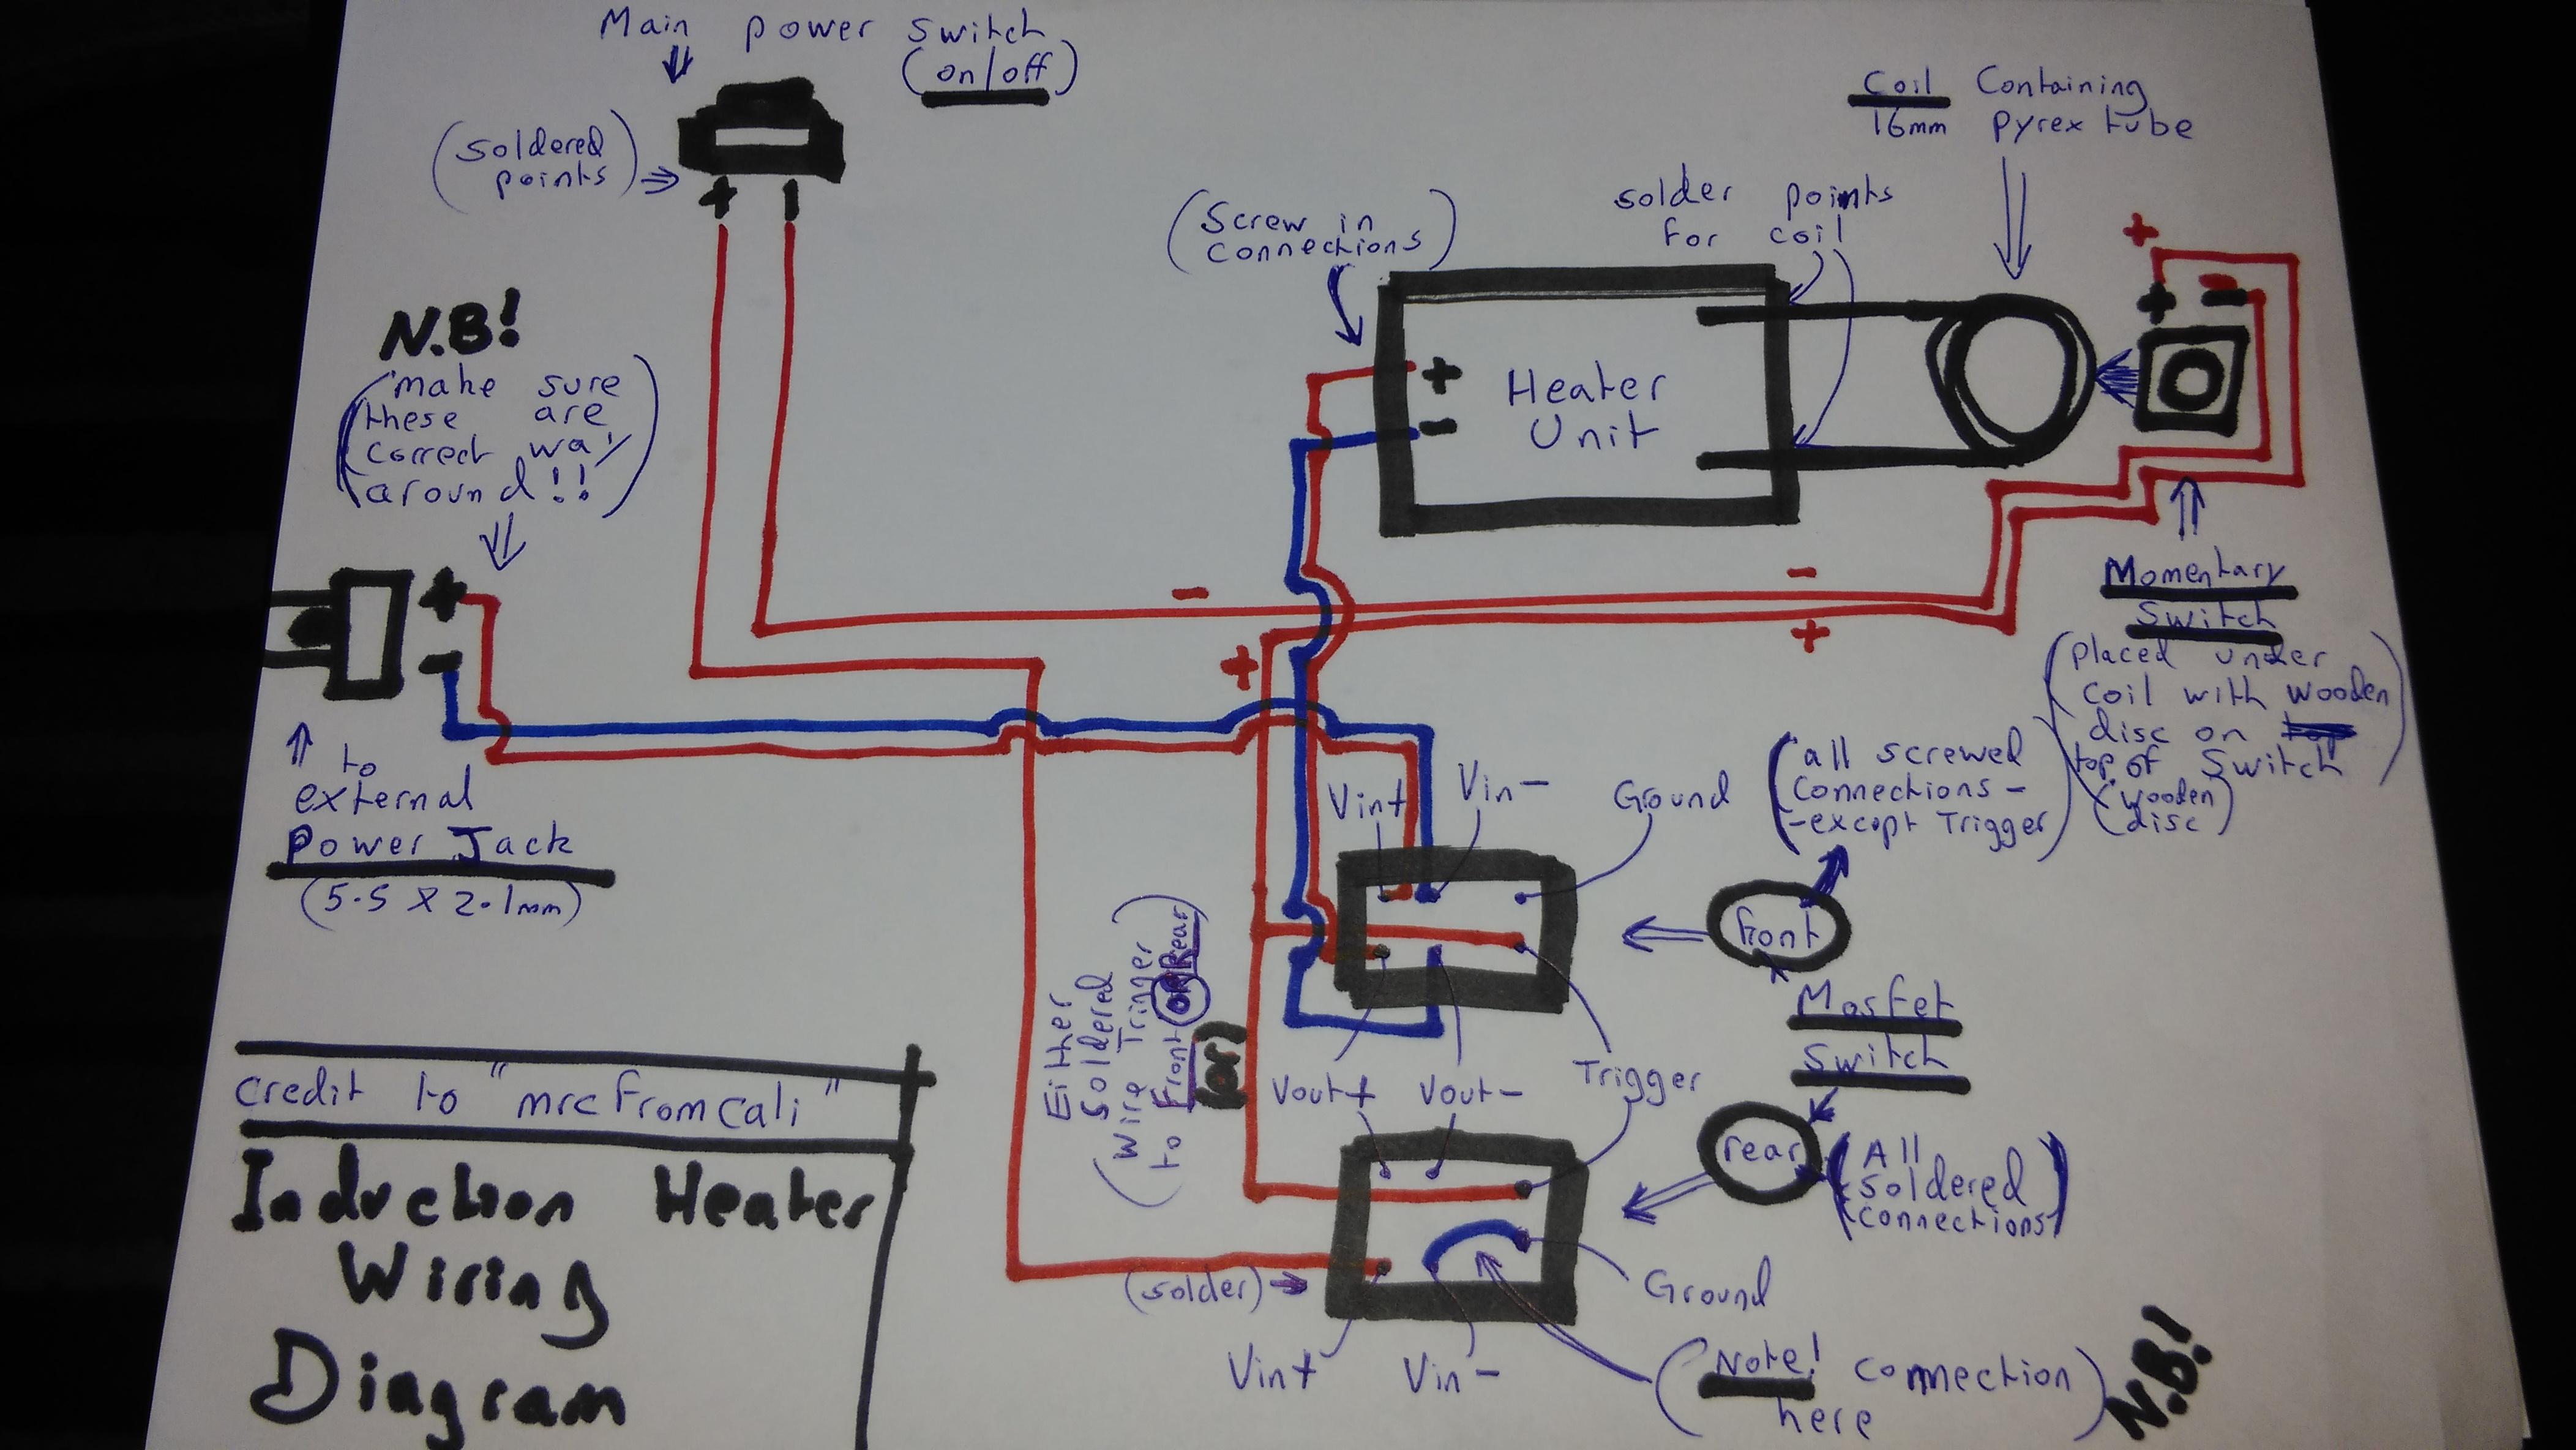 Brilliant Simple Wiring Diagram For Desktop Induction Heater Vaporents Wiring Cloud Picalendutblikvittorg